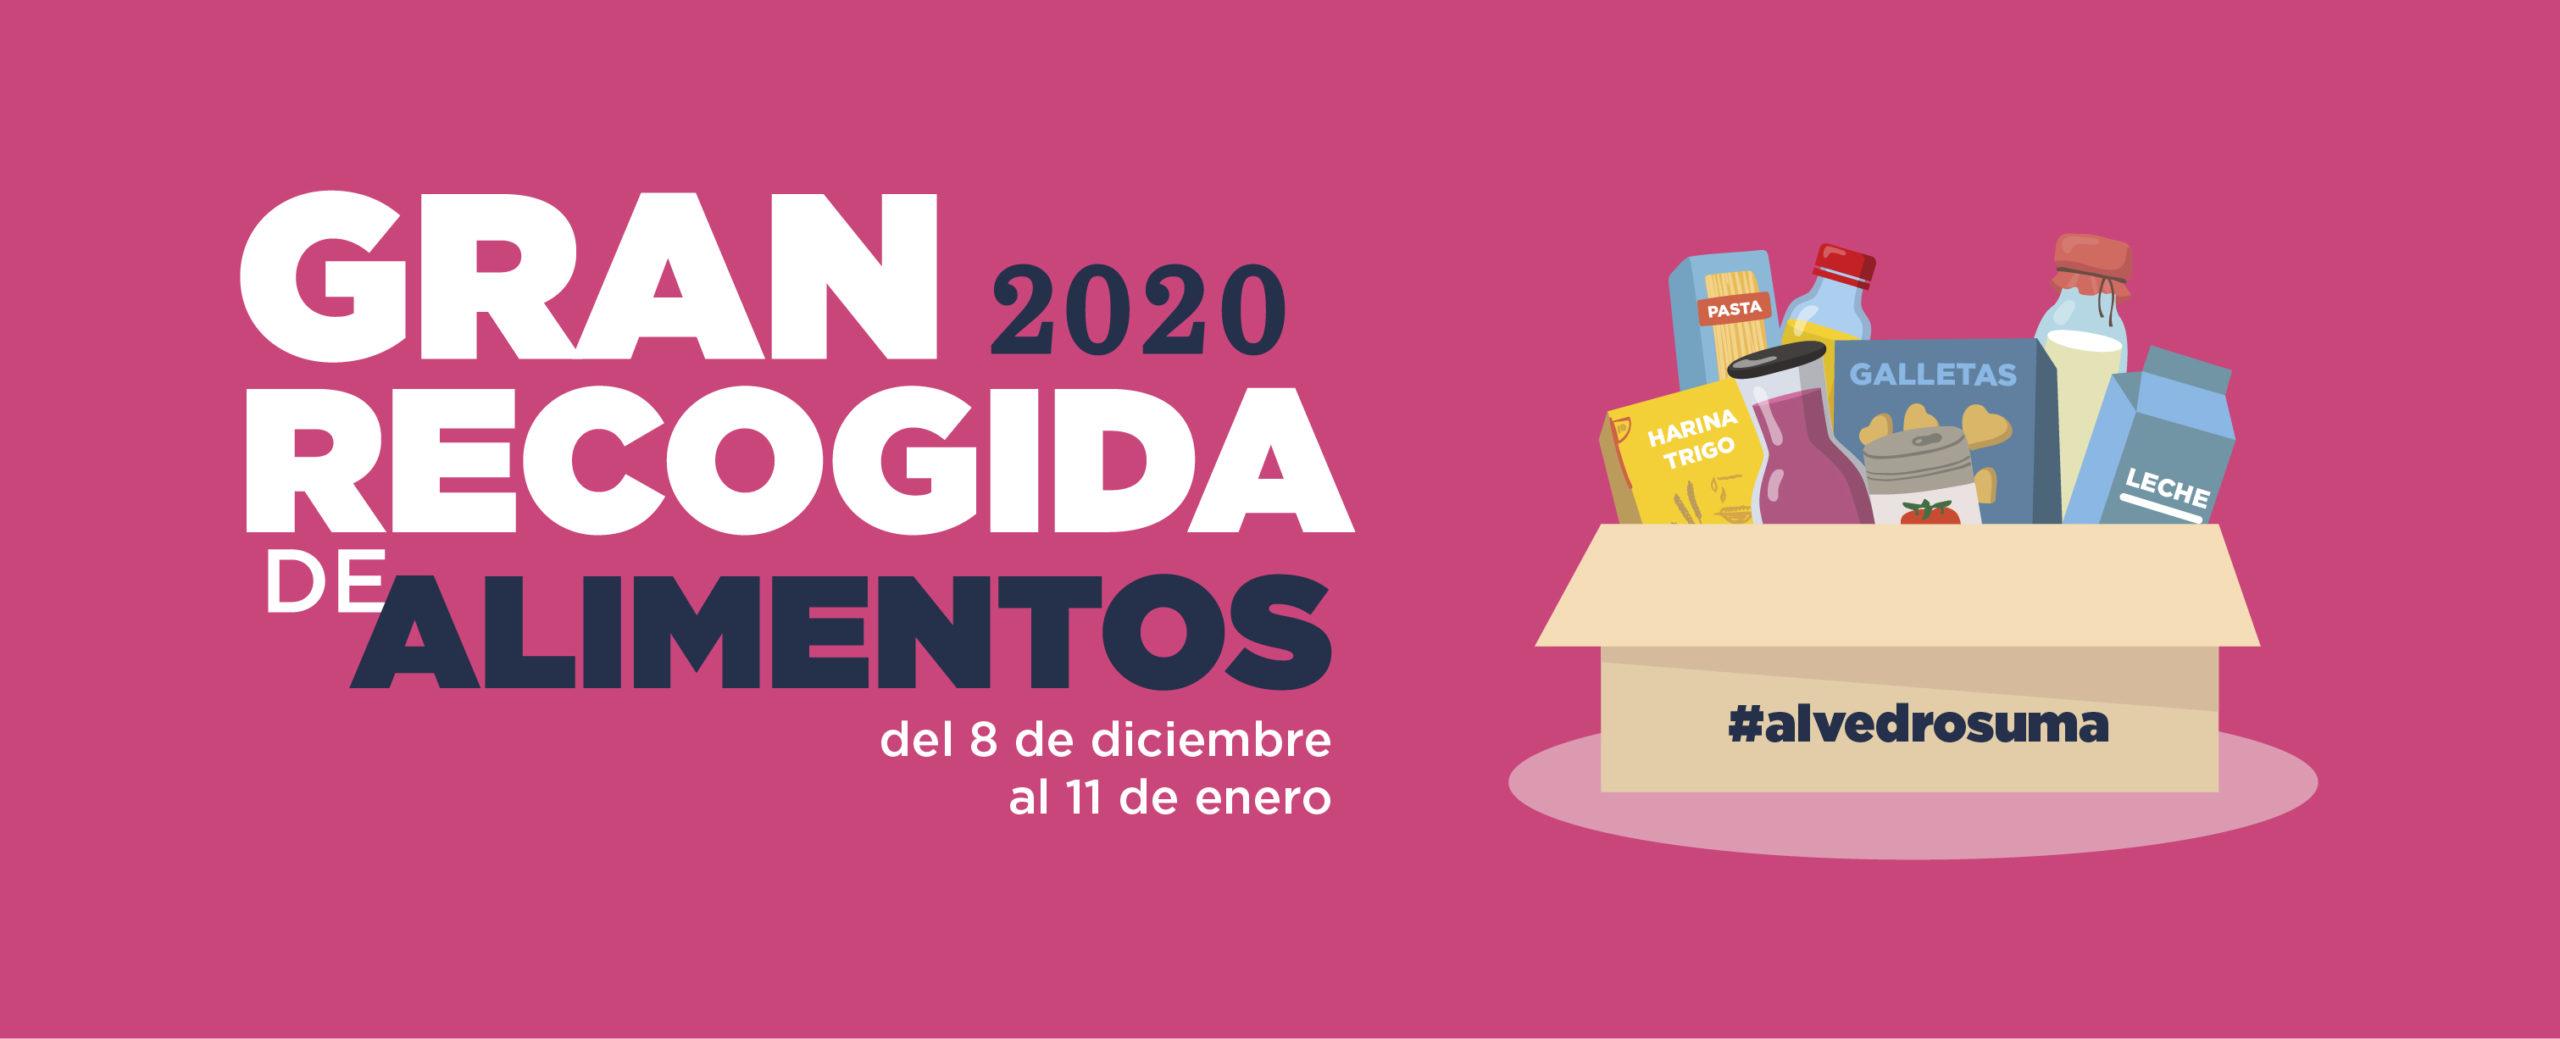 Campaña gran recogida 2020 alimentos